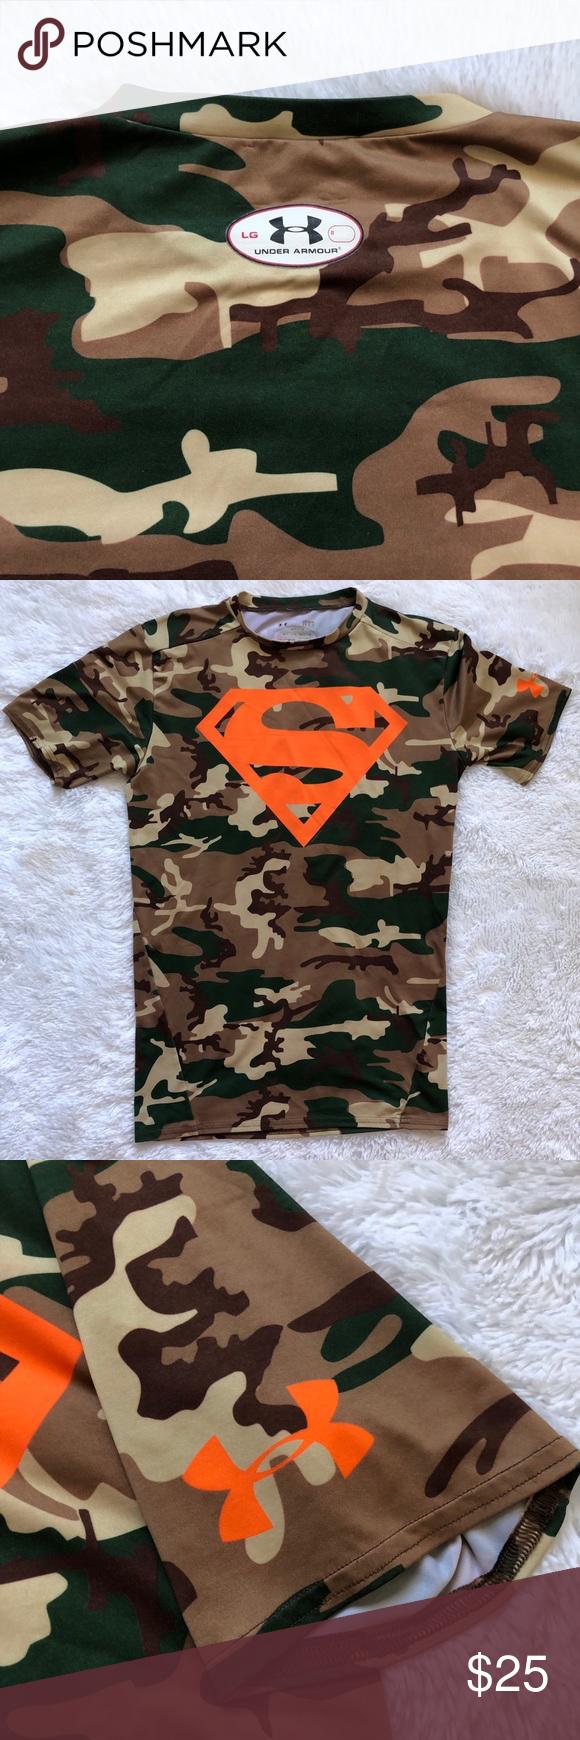 3f8cd262 Under Armour Superman Camo Shirt Camo Superman shirt - UA. Perfect condition!  Under Armour Shirts & Tops Tees - Short Sleeve